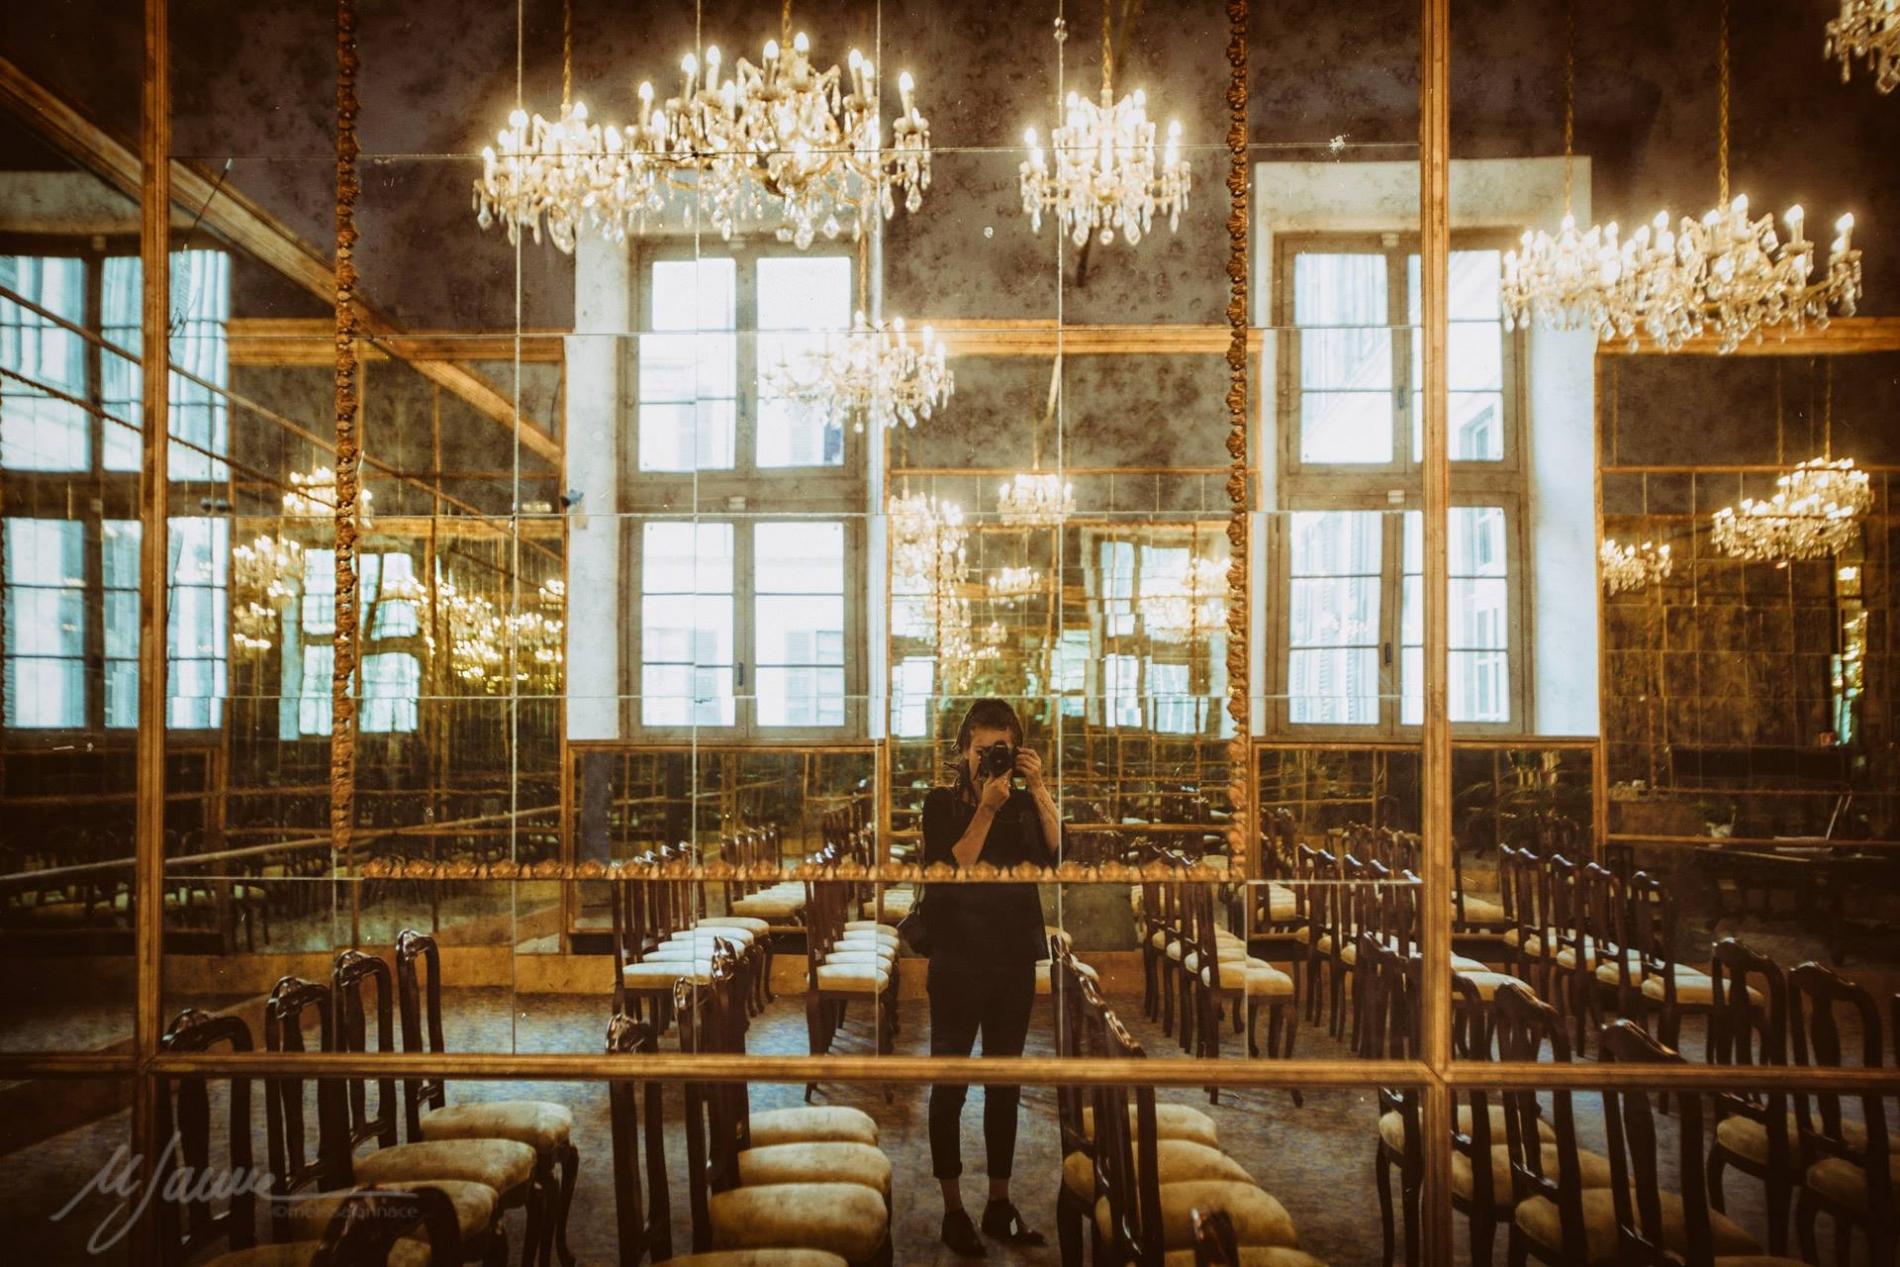 Self Portrait of Melissa Iannace | marriage photography for Modena